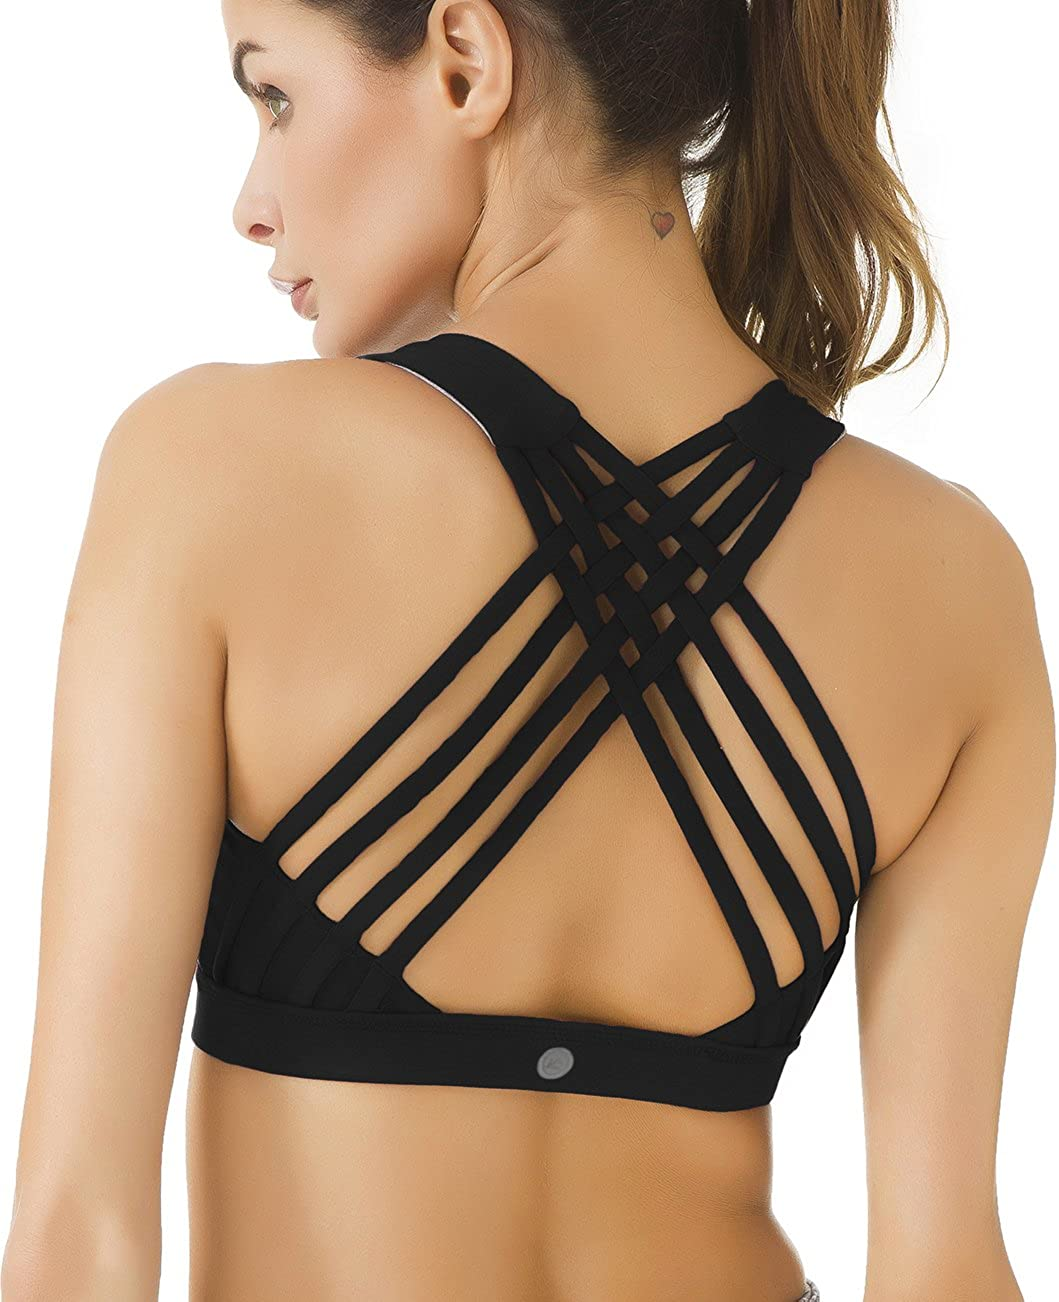 QUEENIEKE Womens Medium Support Strappy Back Energy Sport Bra Cotton Feel